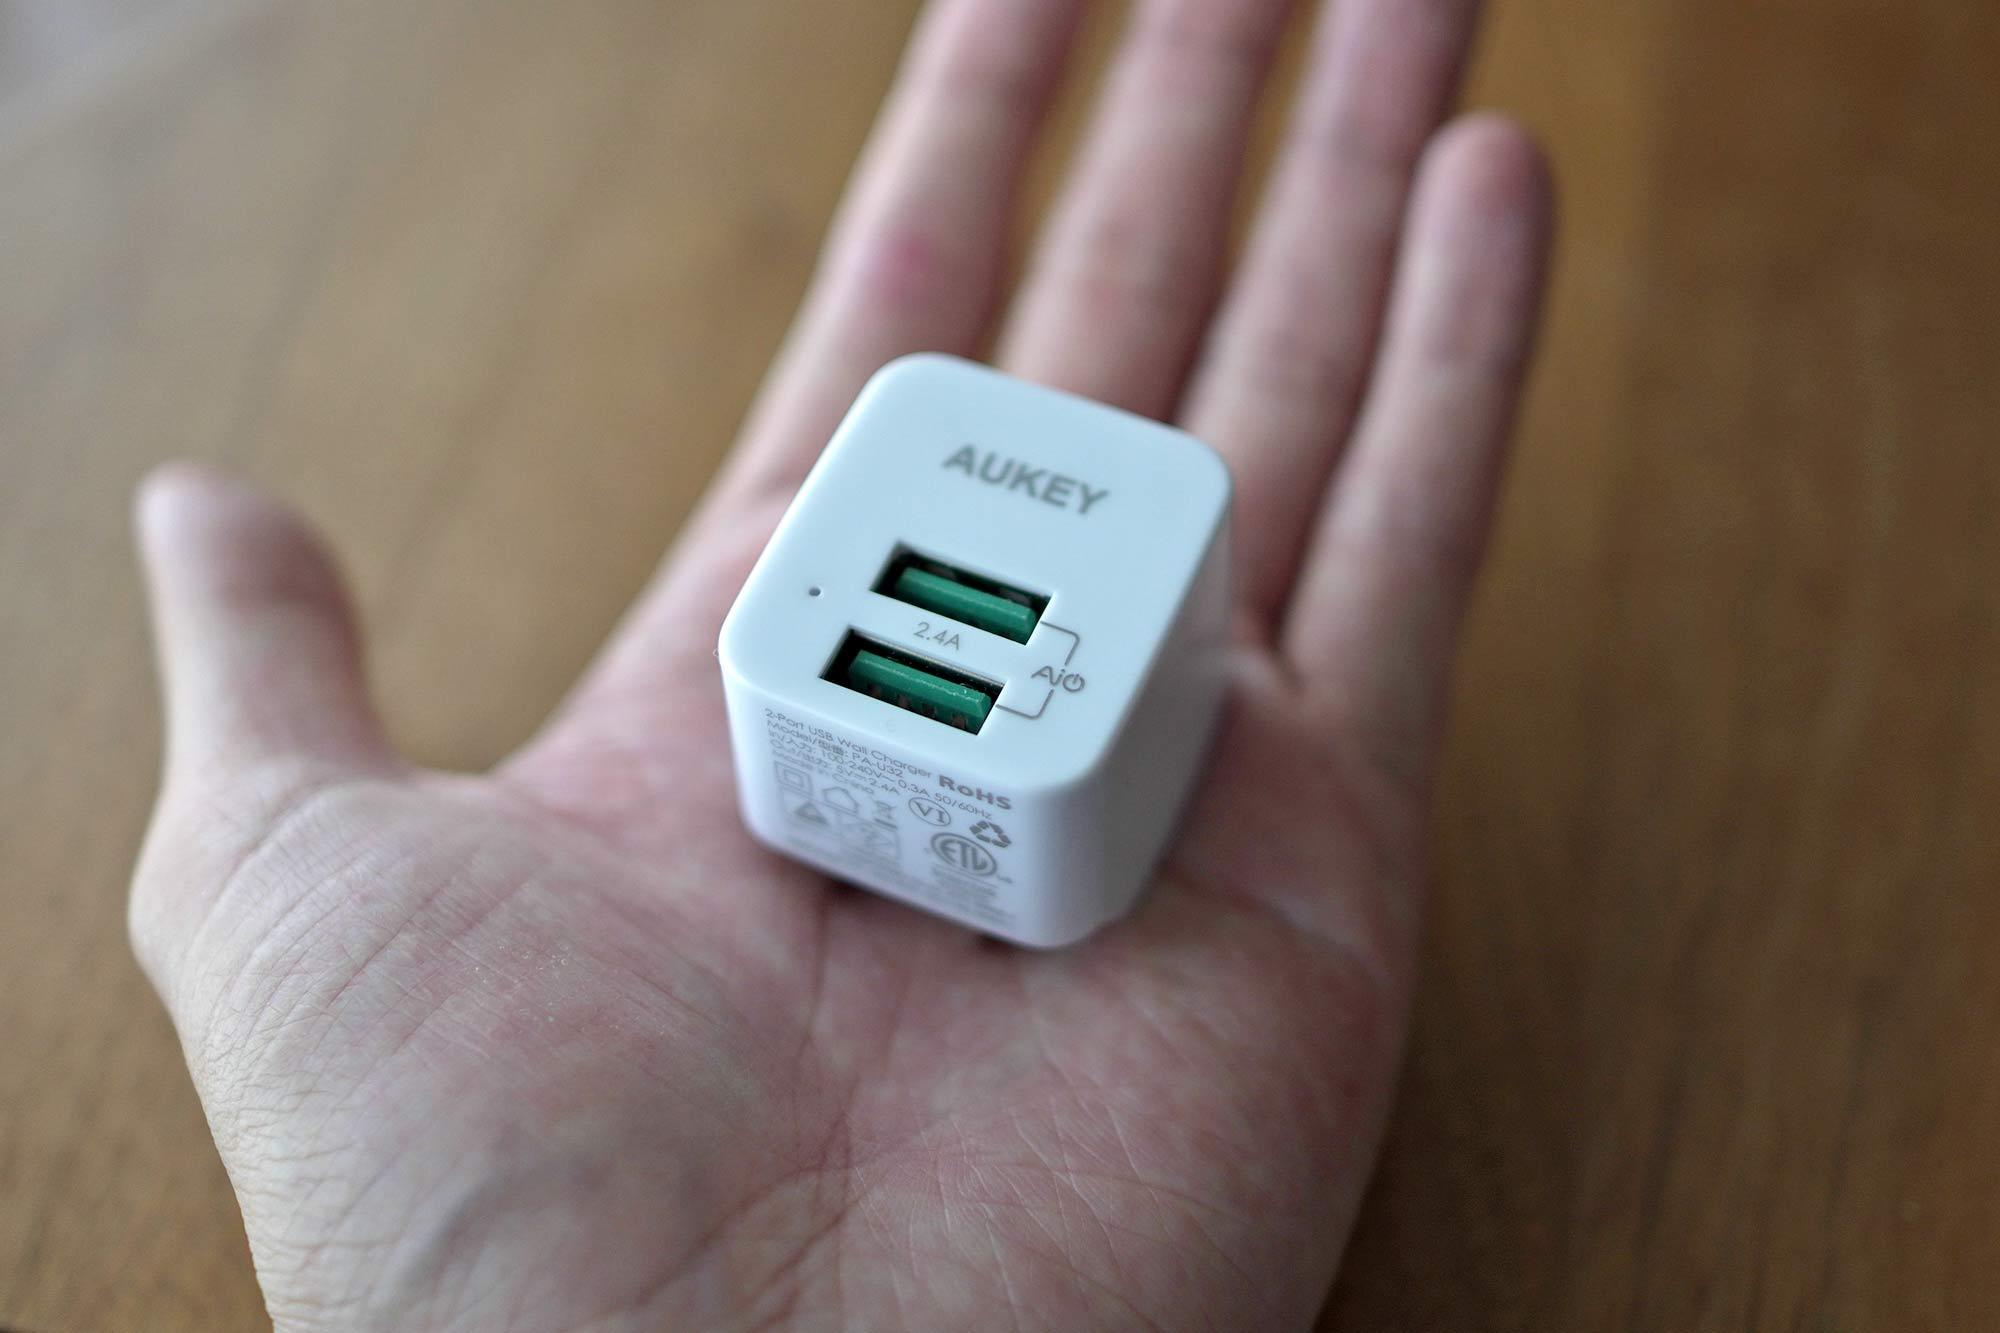 AUKEY,オーキー,充電器,急速充電,USB,2ポート,小型,軽量,軽い